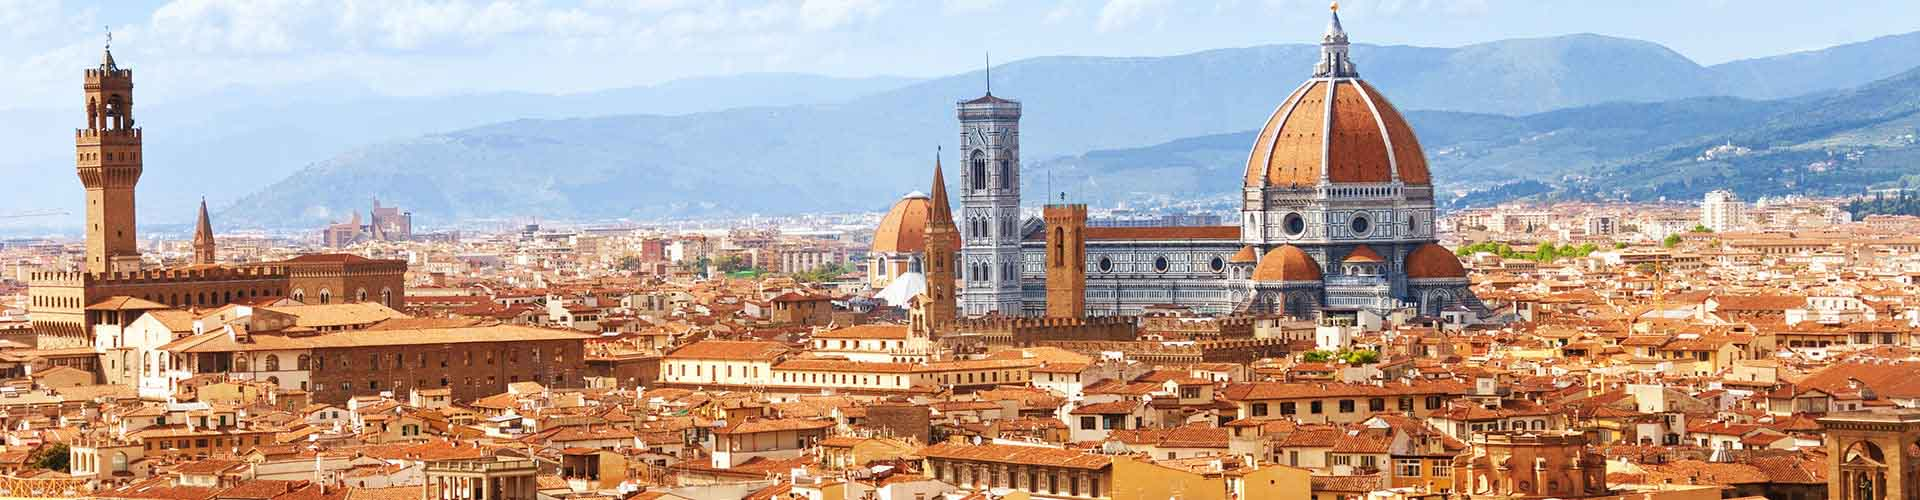 Florencia - Apartamentos cerca a Santa Maria Novella. Mapas de Florencia, Fotos y comentarios de cada Apartamento en Florencia.